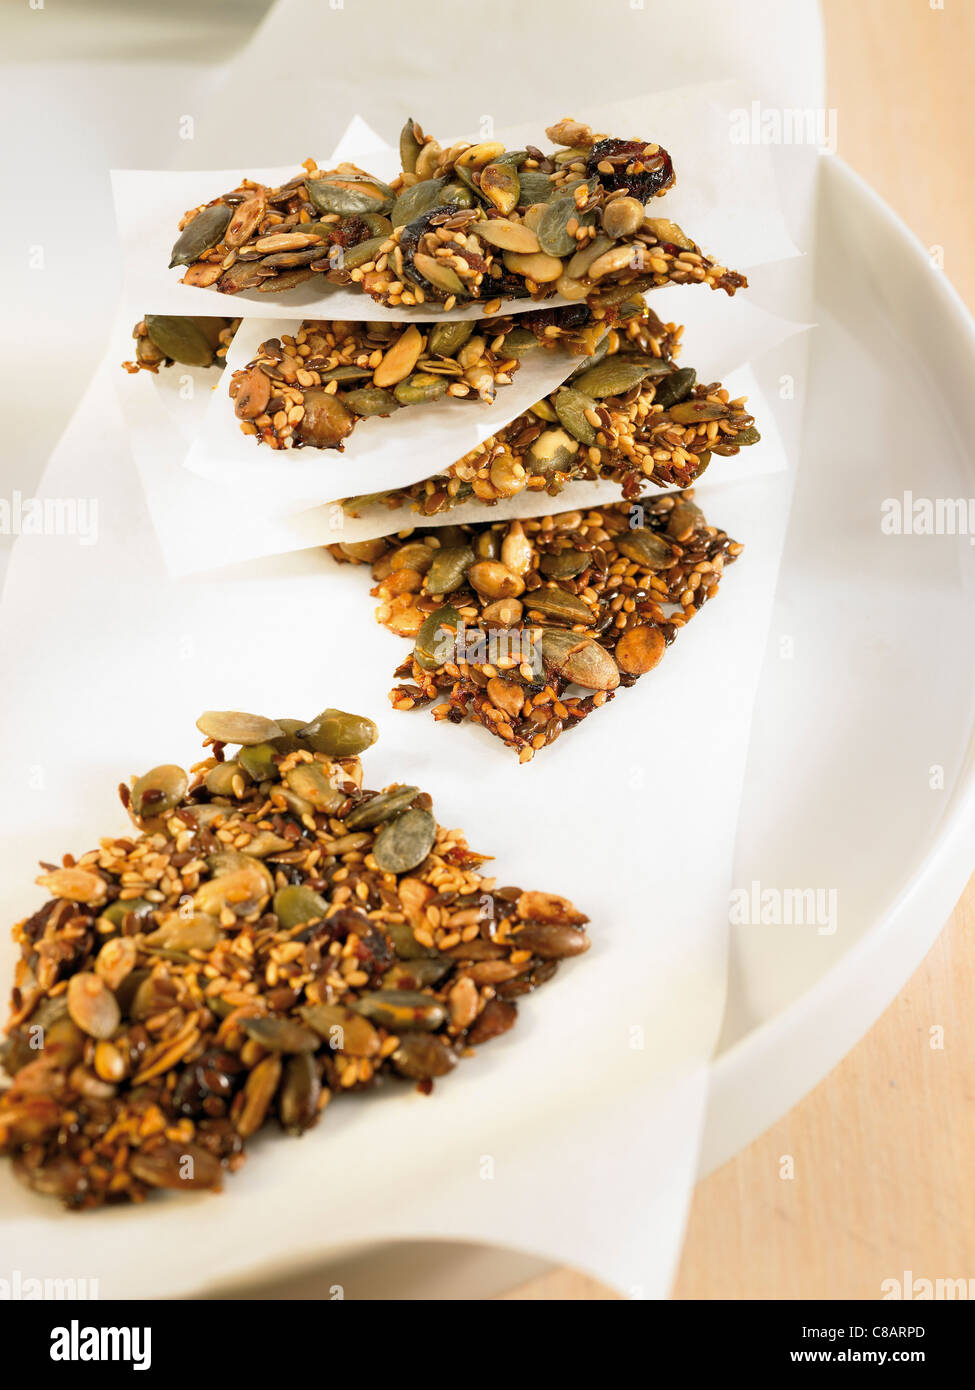 Seedy snacks - Stock Image